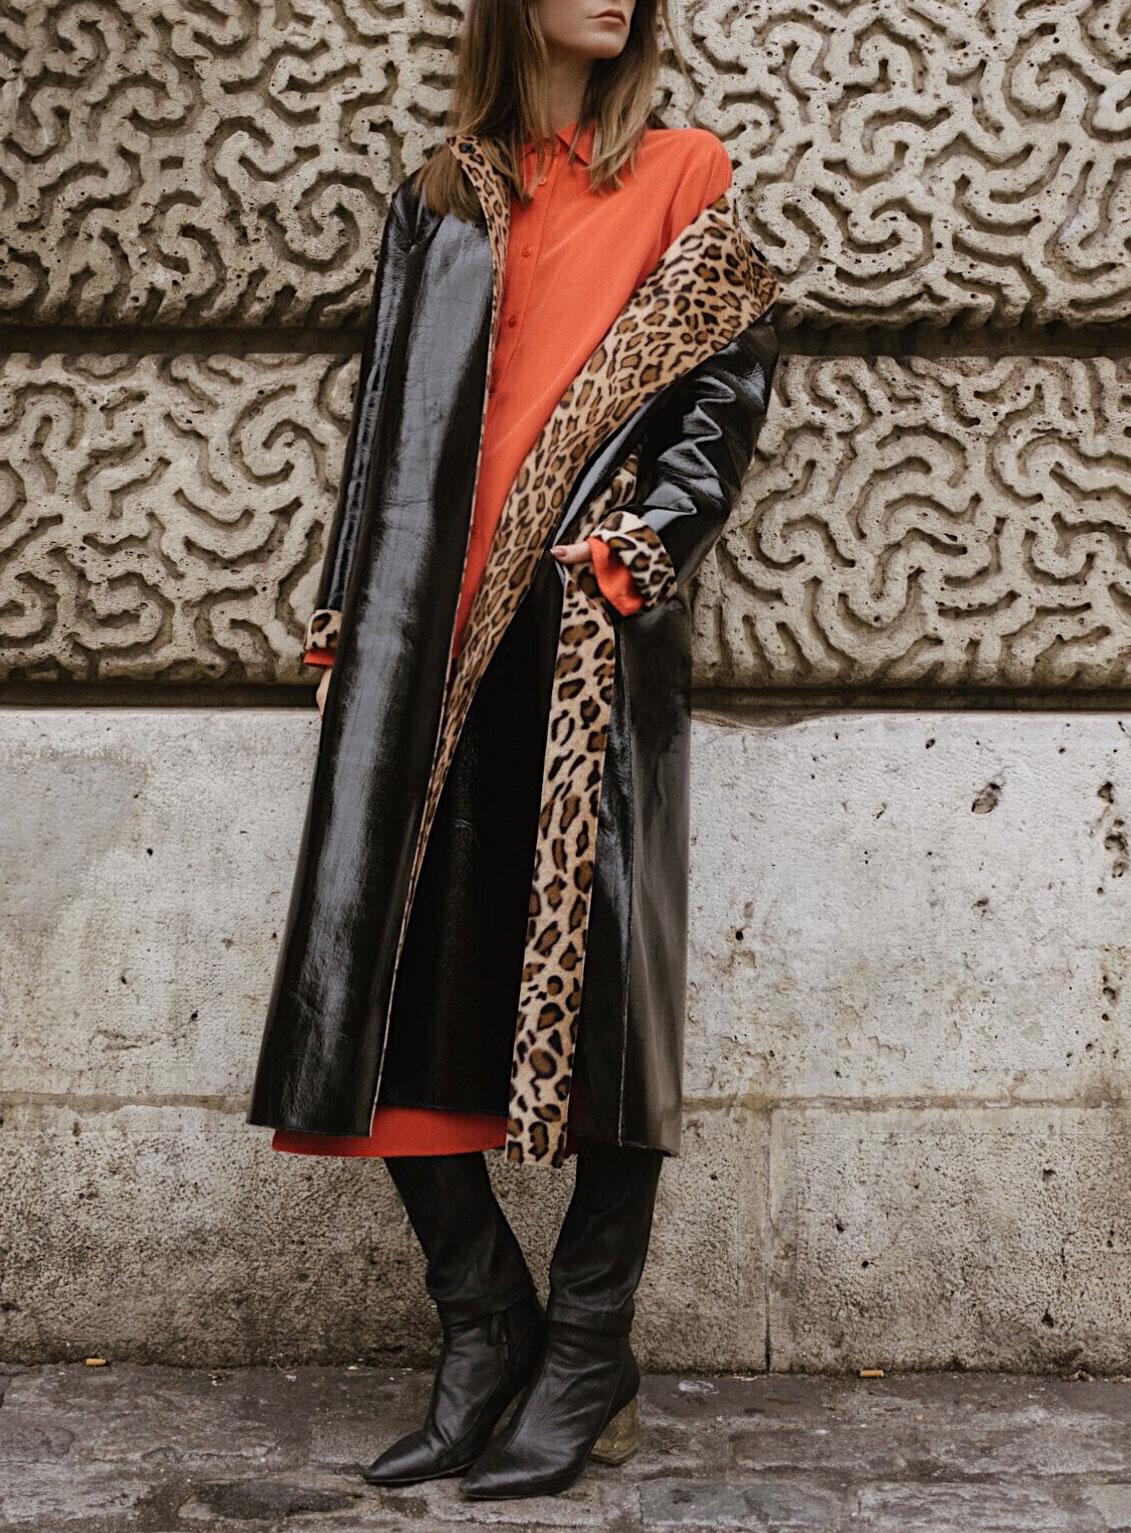 Black Leo Trench With Orange Red Silk Ays Yuva Hoc Premium Bluedark Full Set Suit Gold Jewellery Art Youth Society Dress Jadicted Shirt Leather Pants Coat Stand Official Shoes Zara Cap